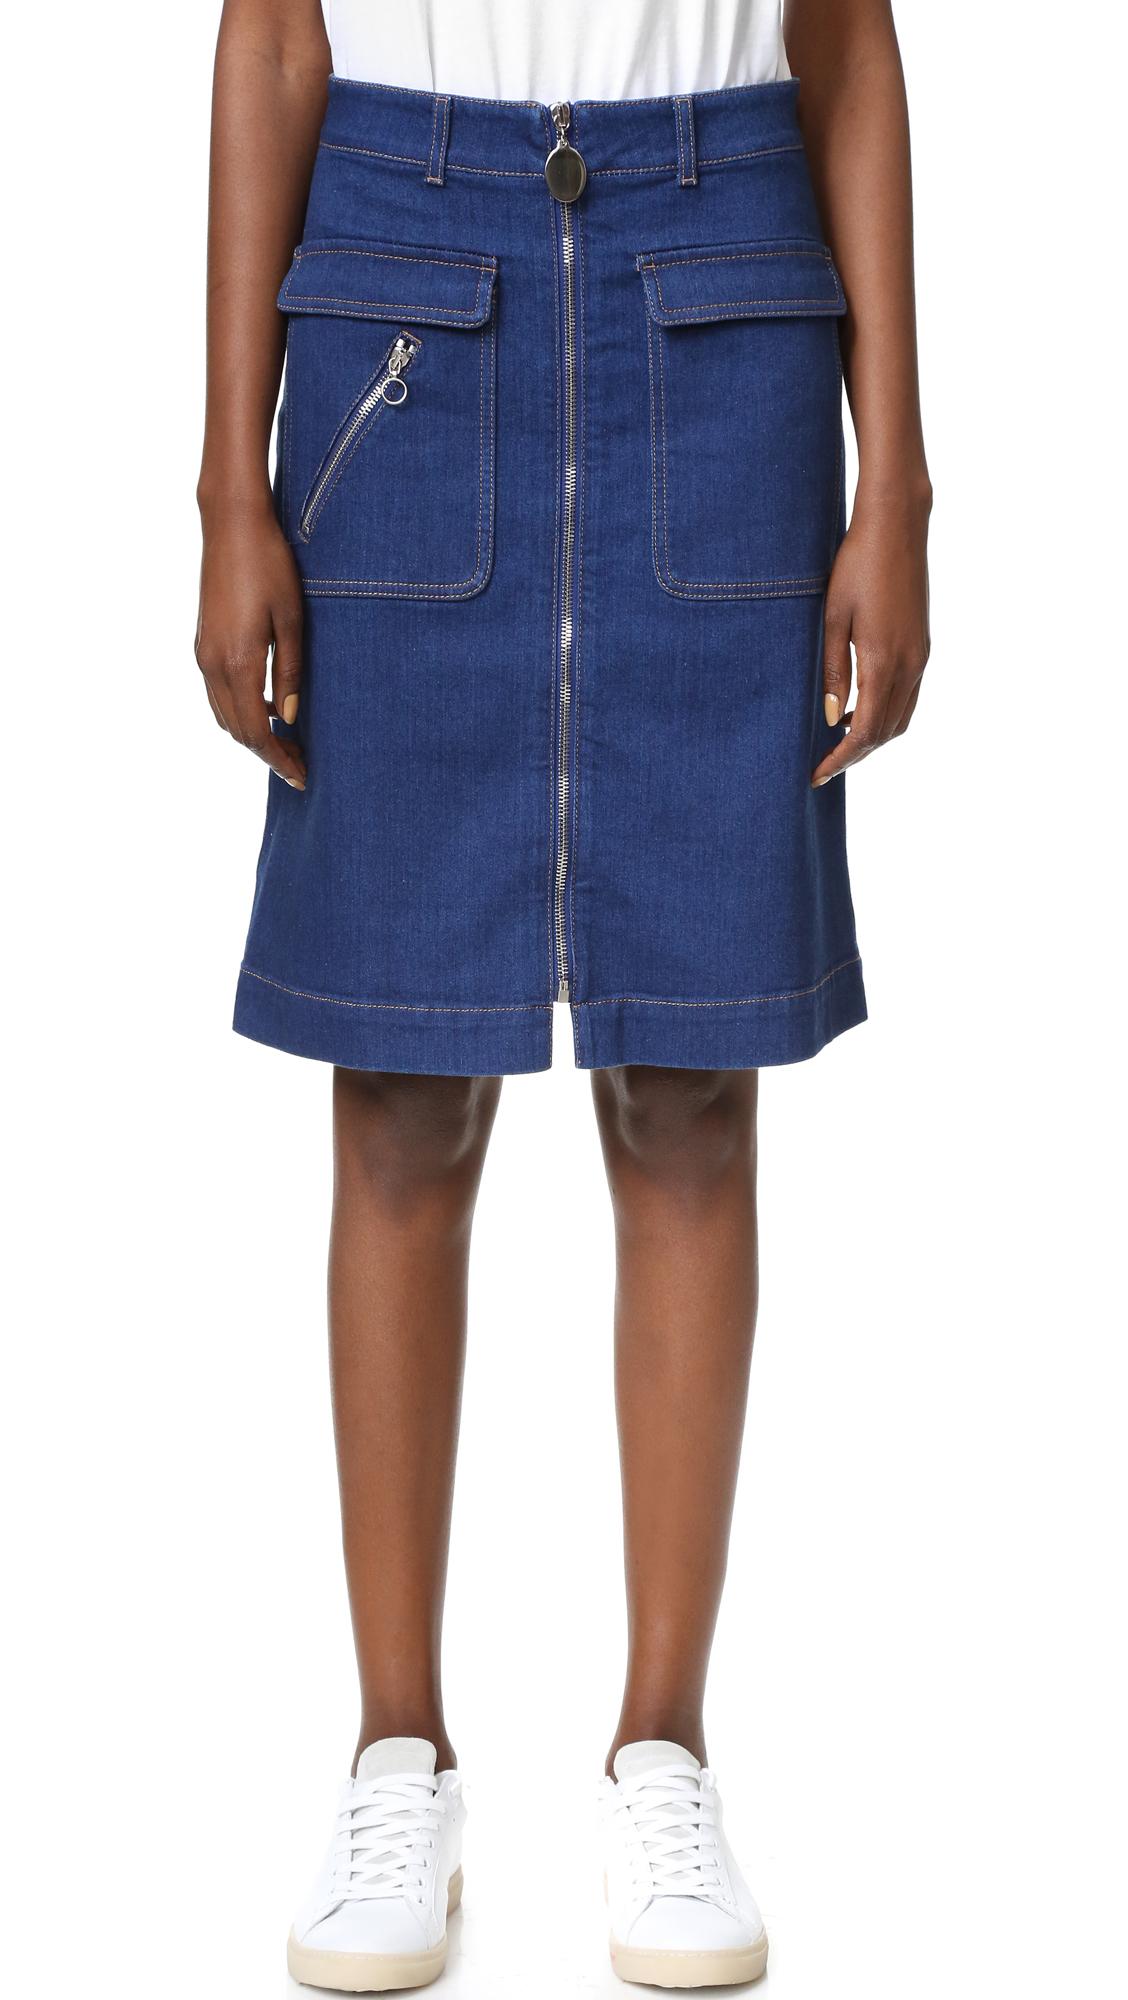 stella mccartney denim skirt in blue lyst